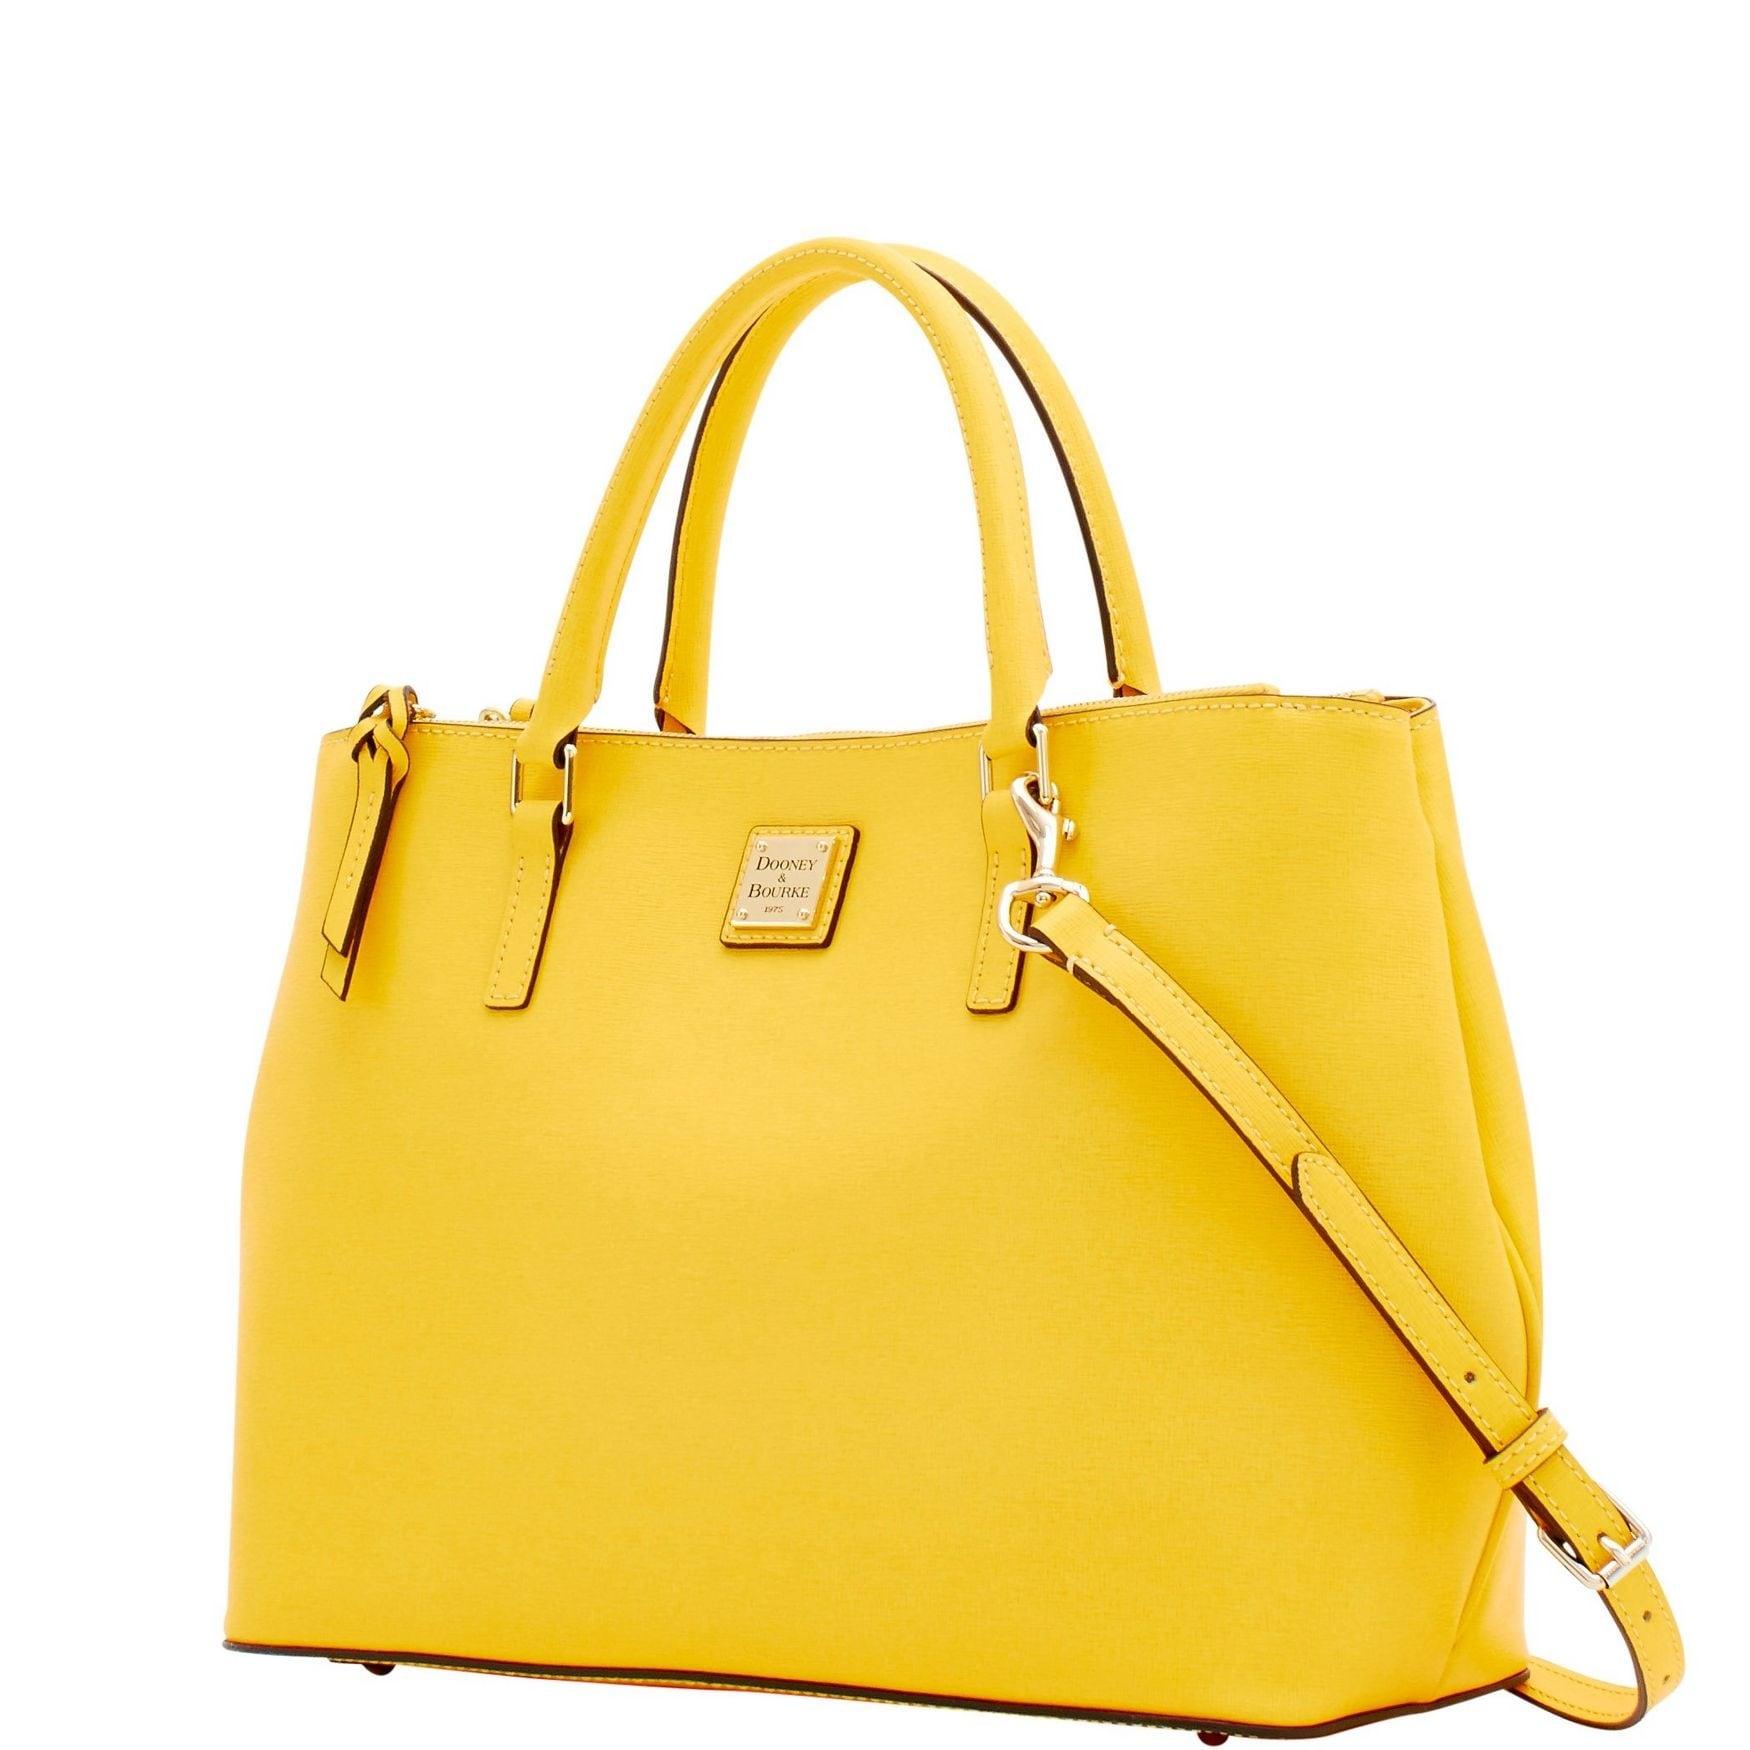 3792836d9 Shop Dooney   Bourke Saffiano Willa Zip Satchel (Introduced by Dooney    Bourke in Feb 2018) - Free Shipping Today - Overstock - 20122043